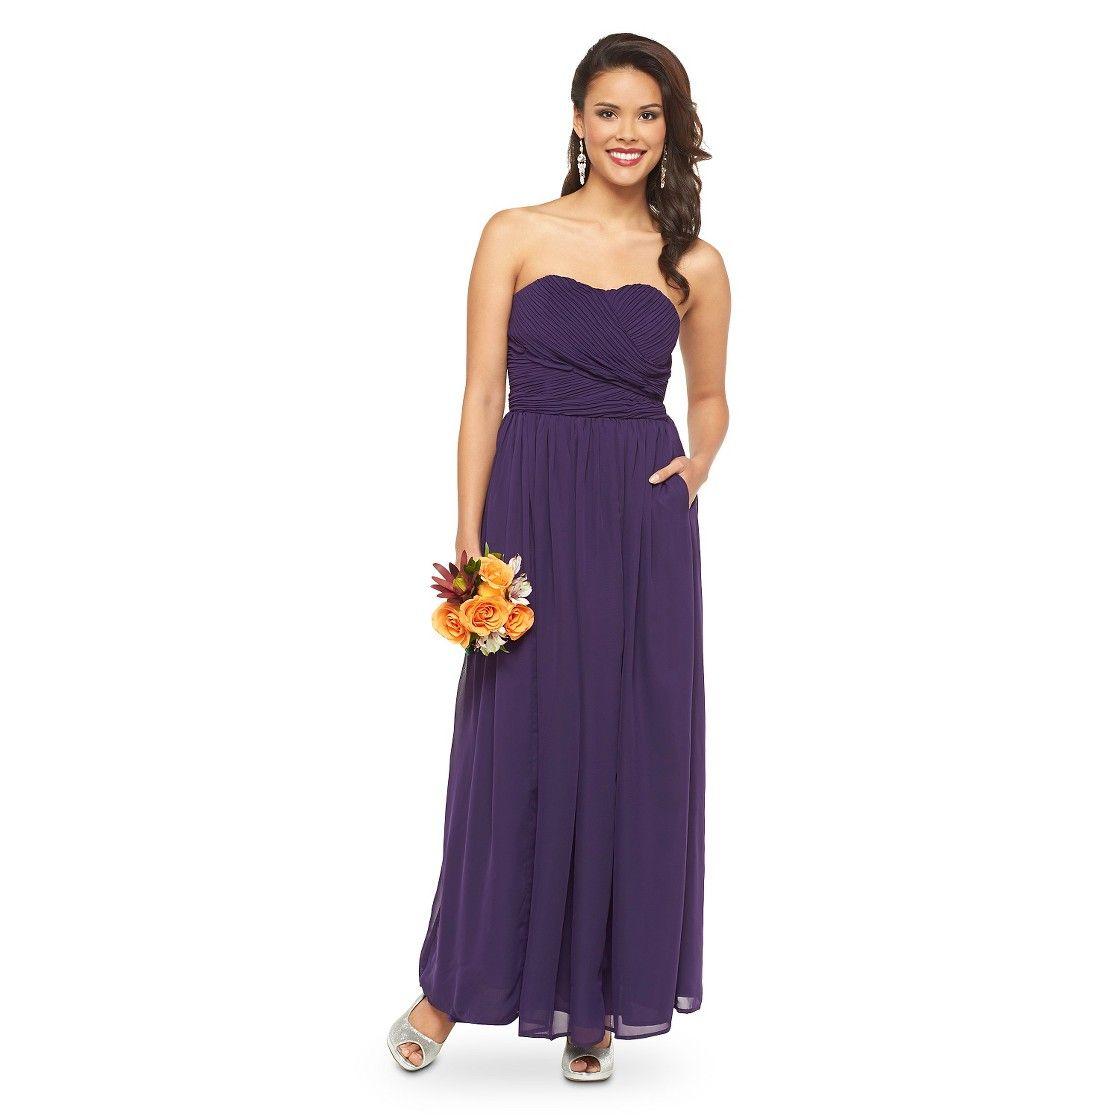 Women\'s Chiffon Strapless Maxi Bridesmaid Dress Fashion Colors ...